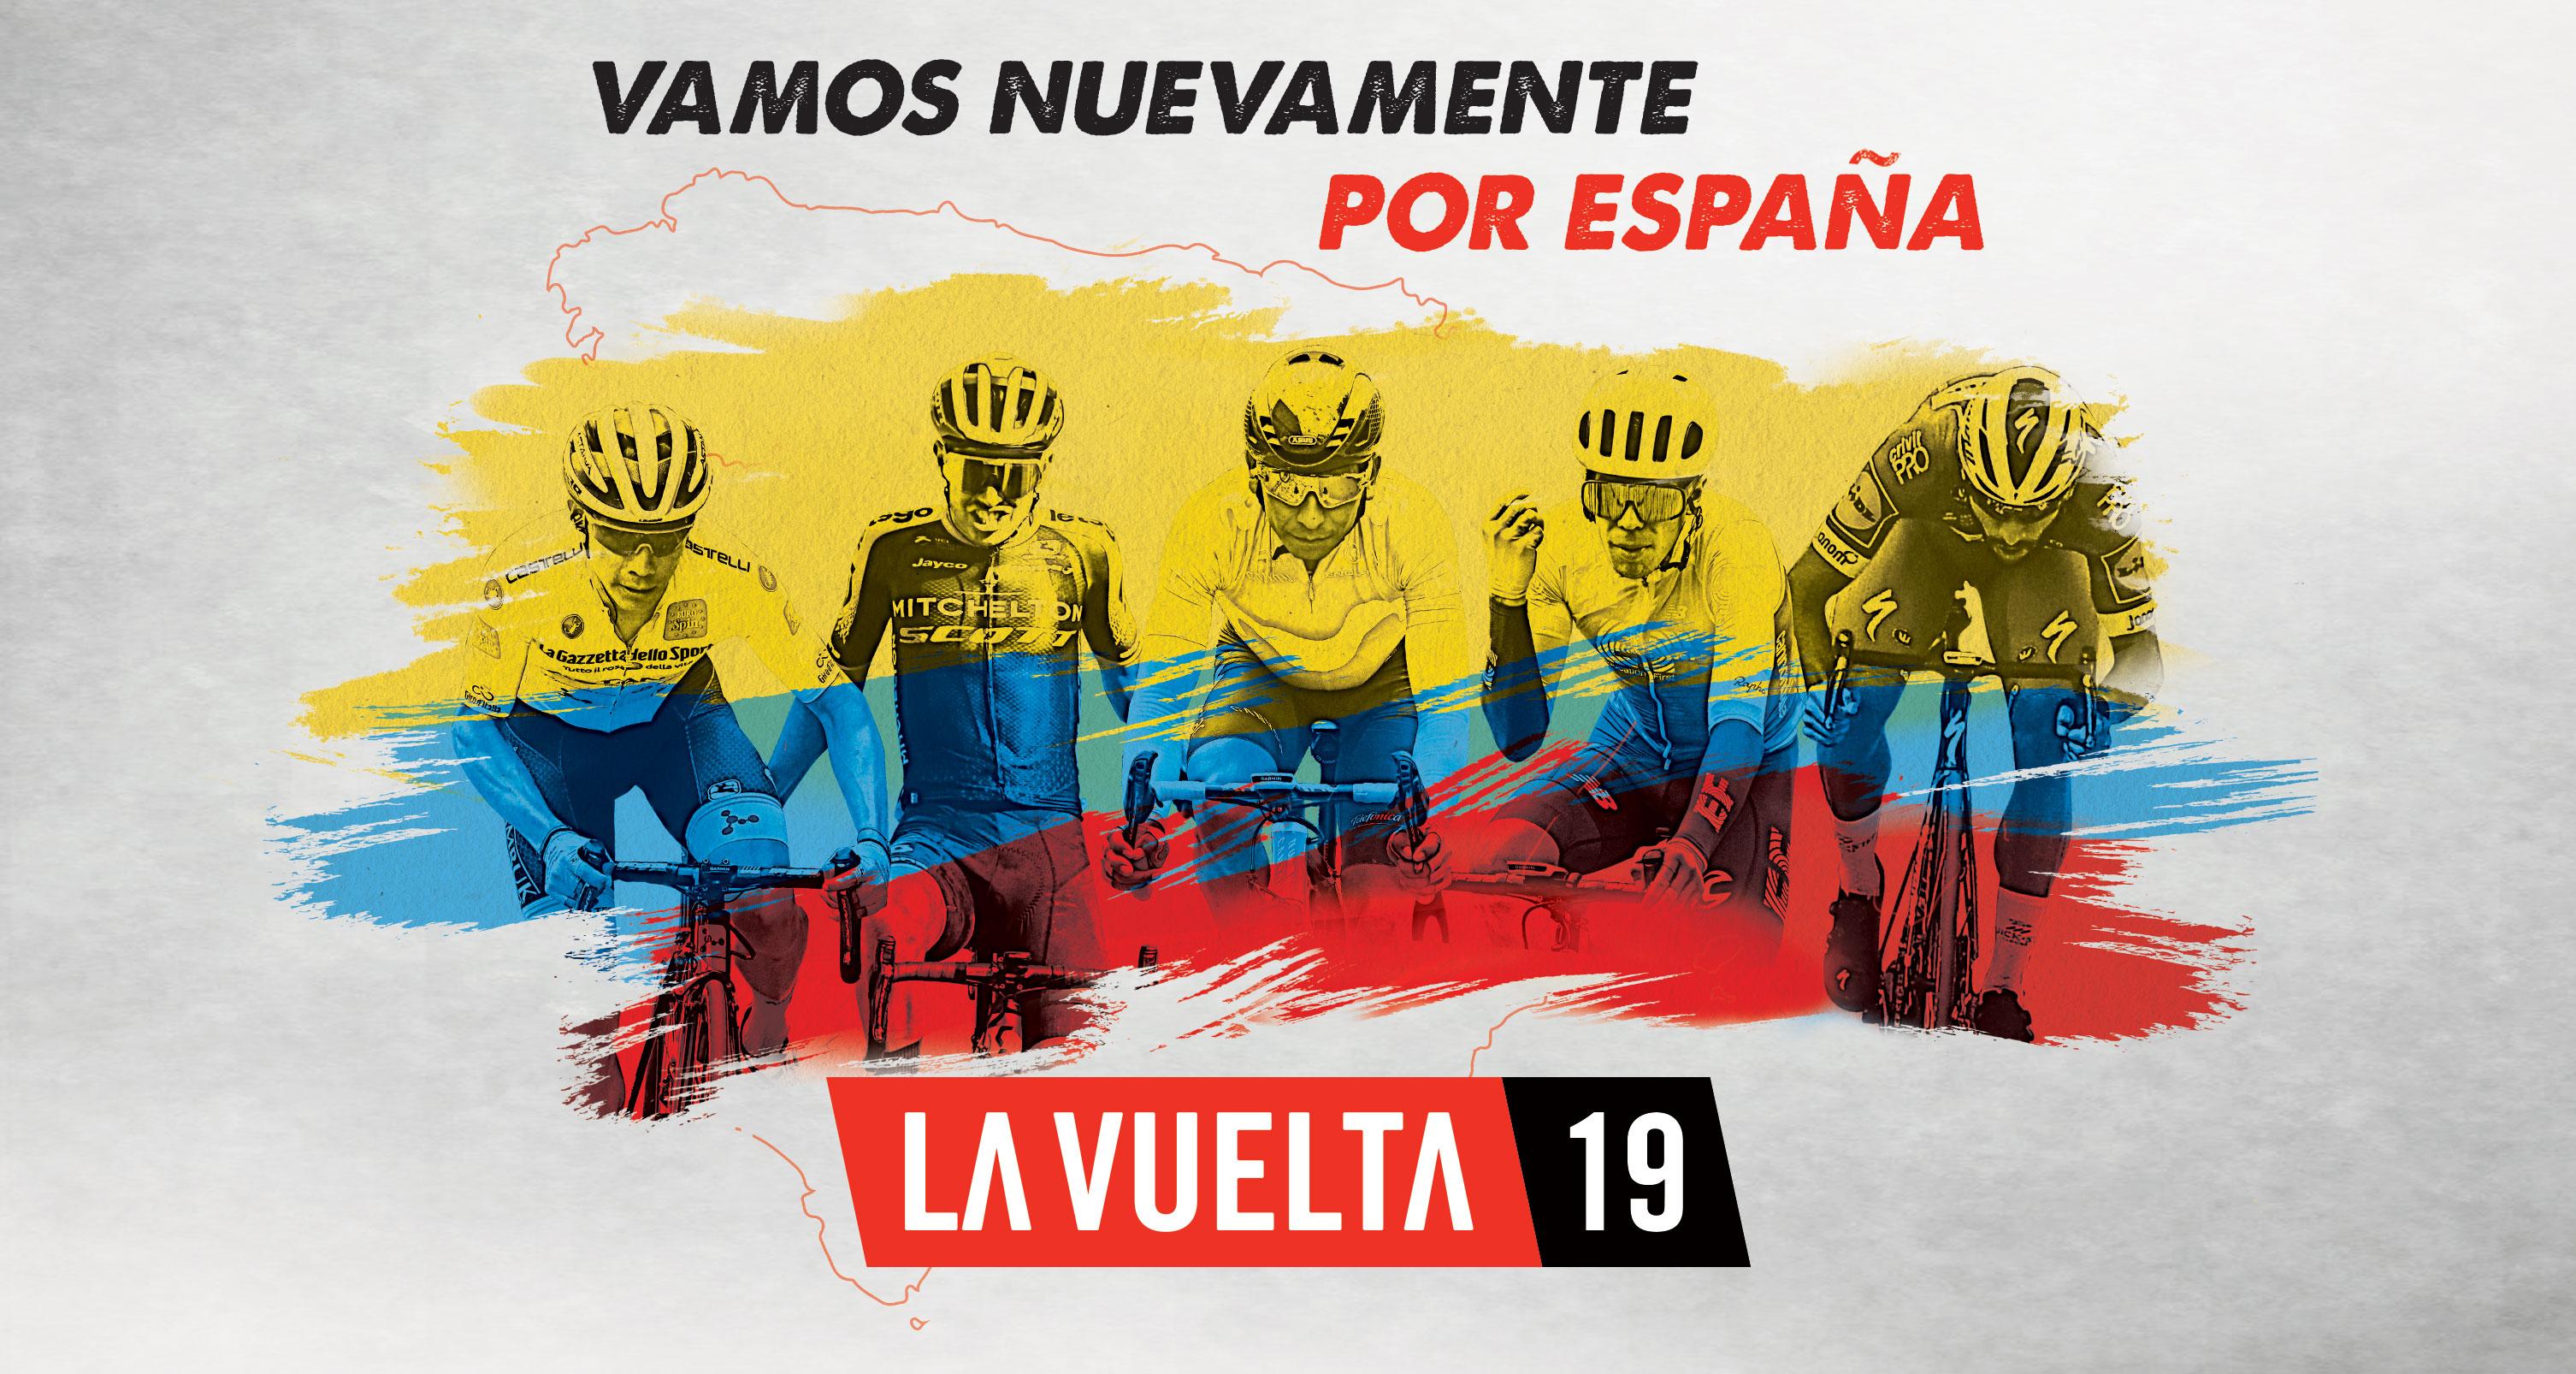 La vuelta a España, por Caracol Televisión